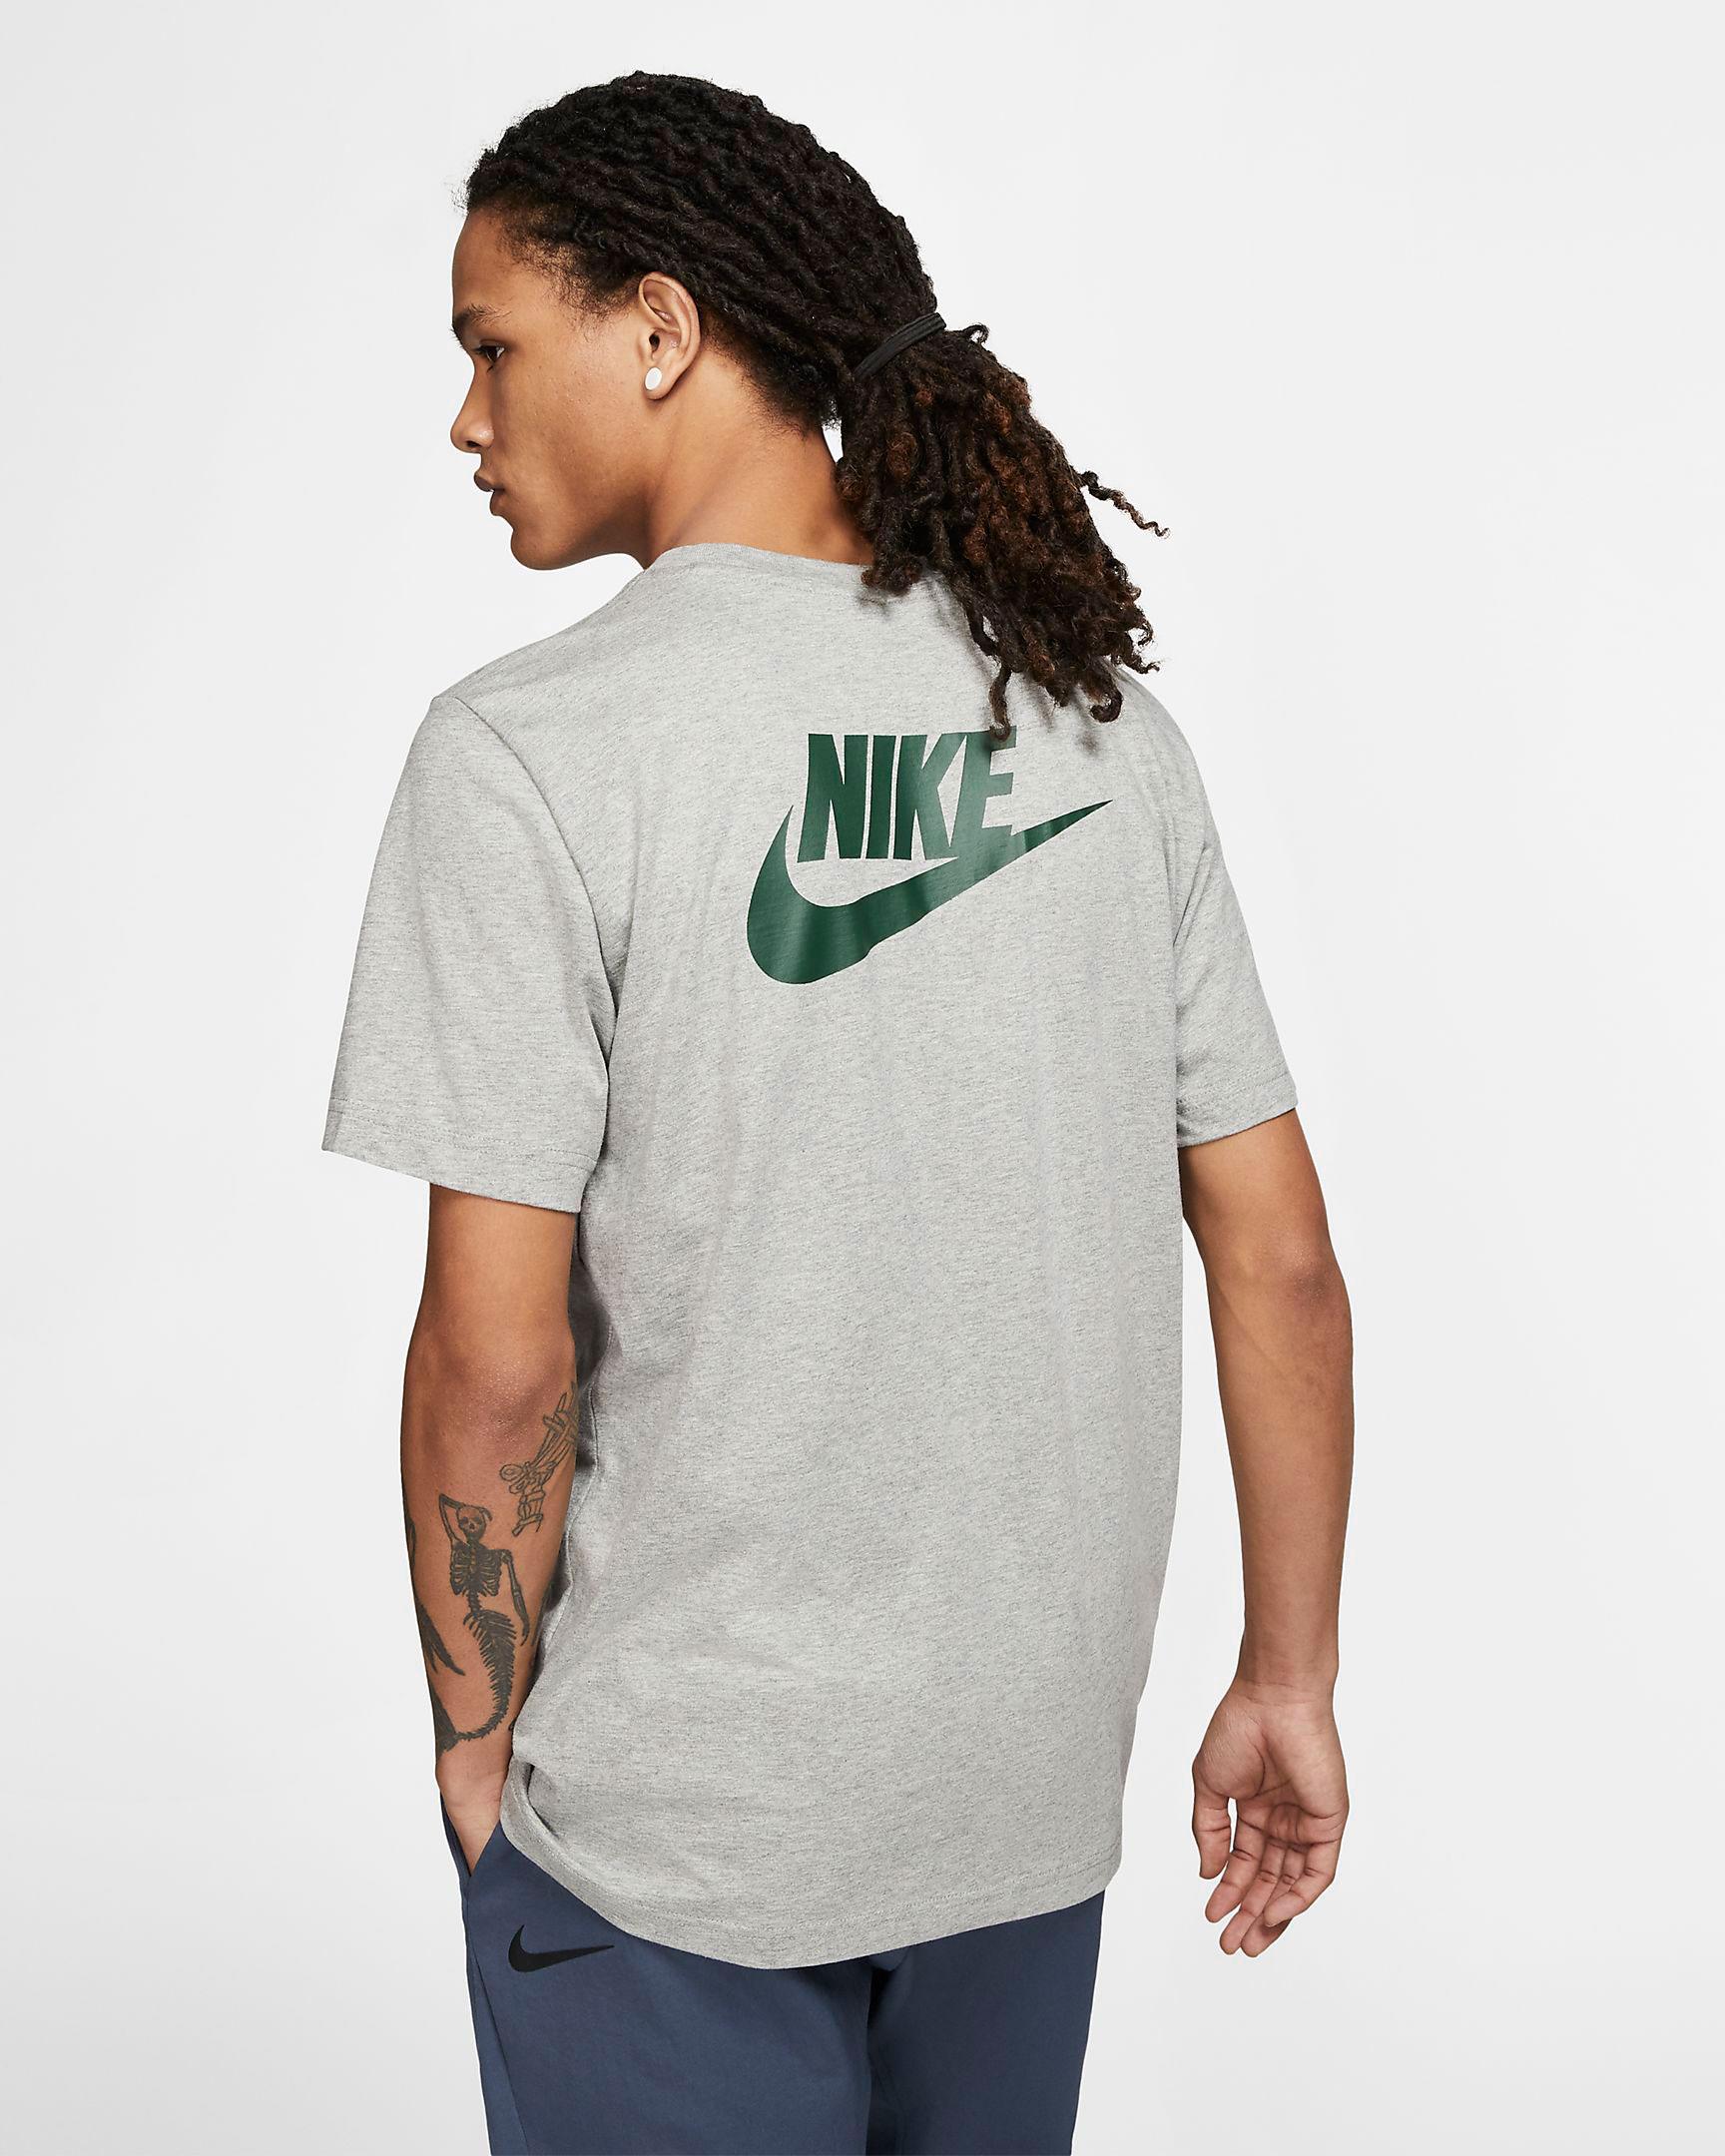 nike-stranger-things-hawkins-high-t-shirt-grey-2